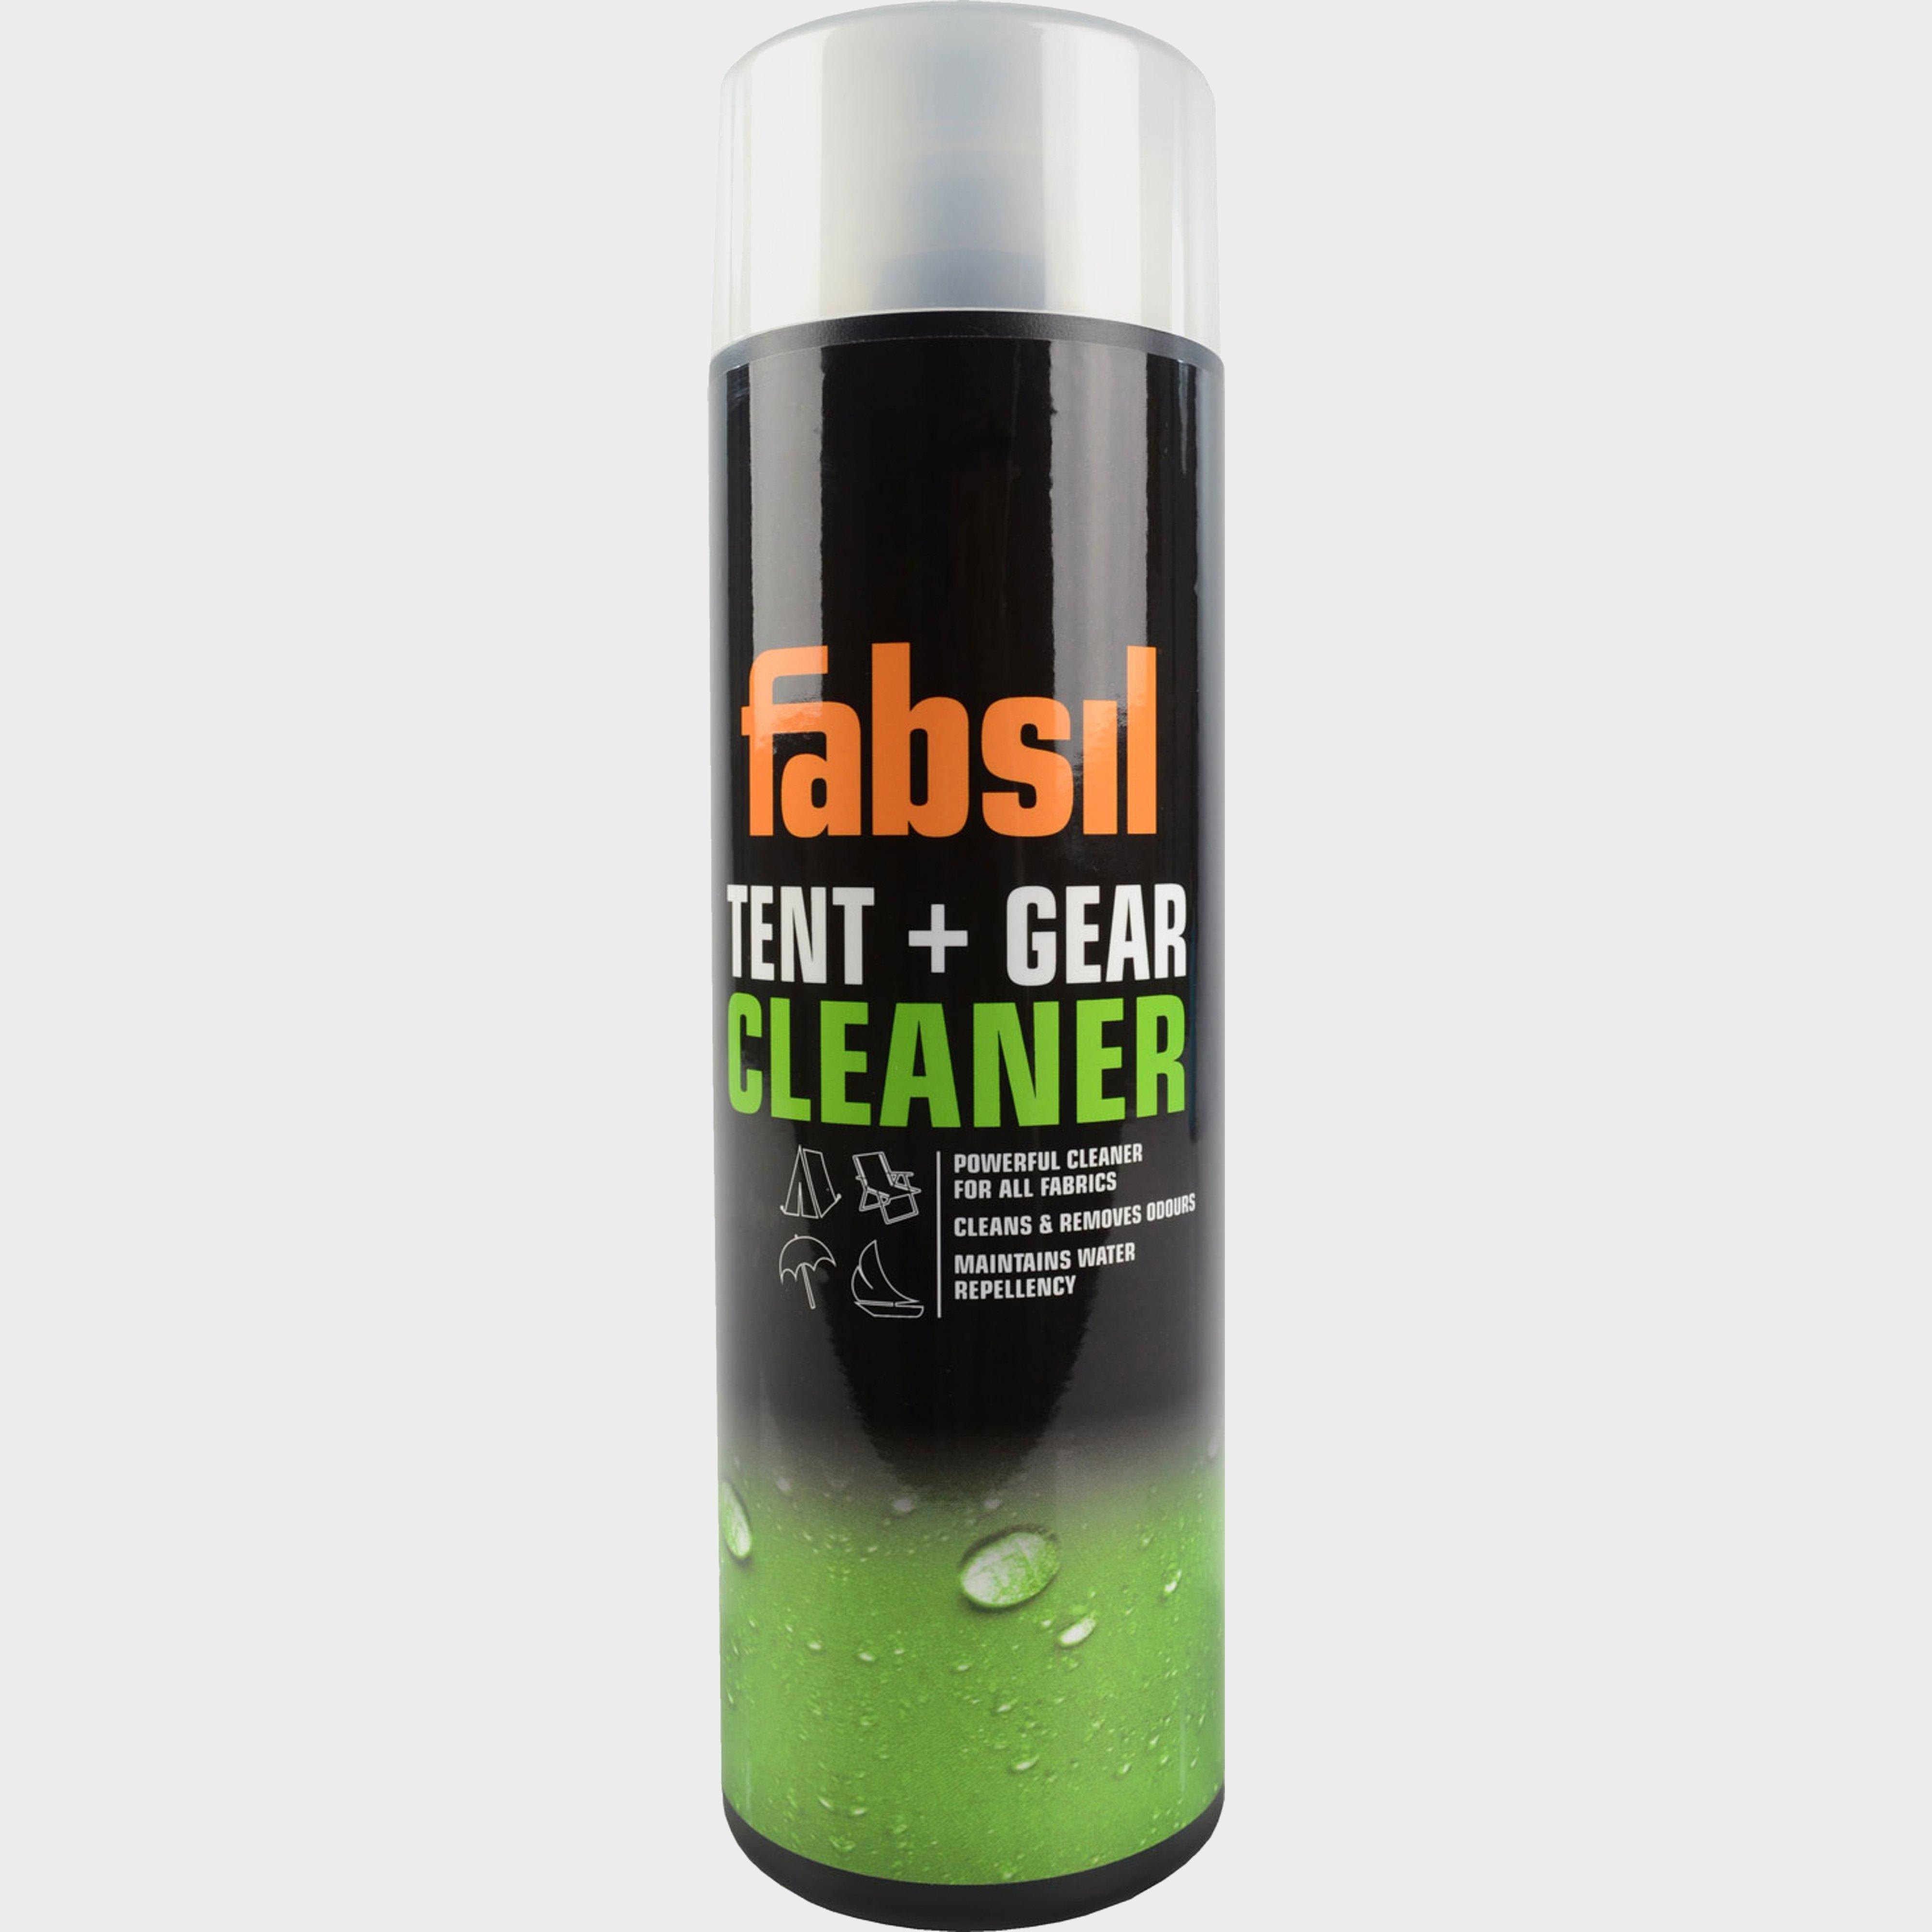 Grangers Grangers Fabsil Tent + Gear Cleaner (500ml) - Black, Black